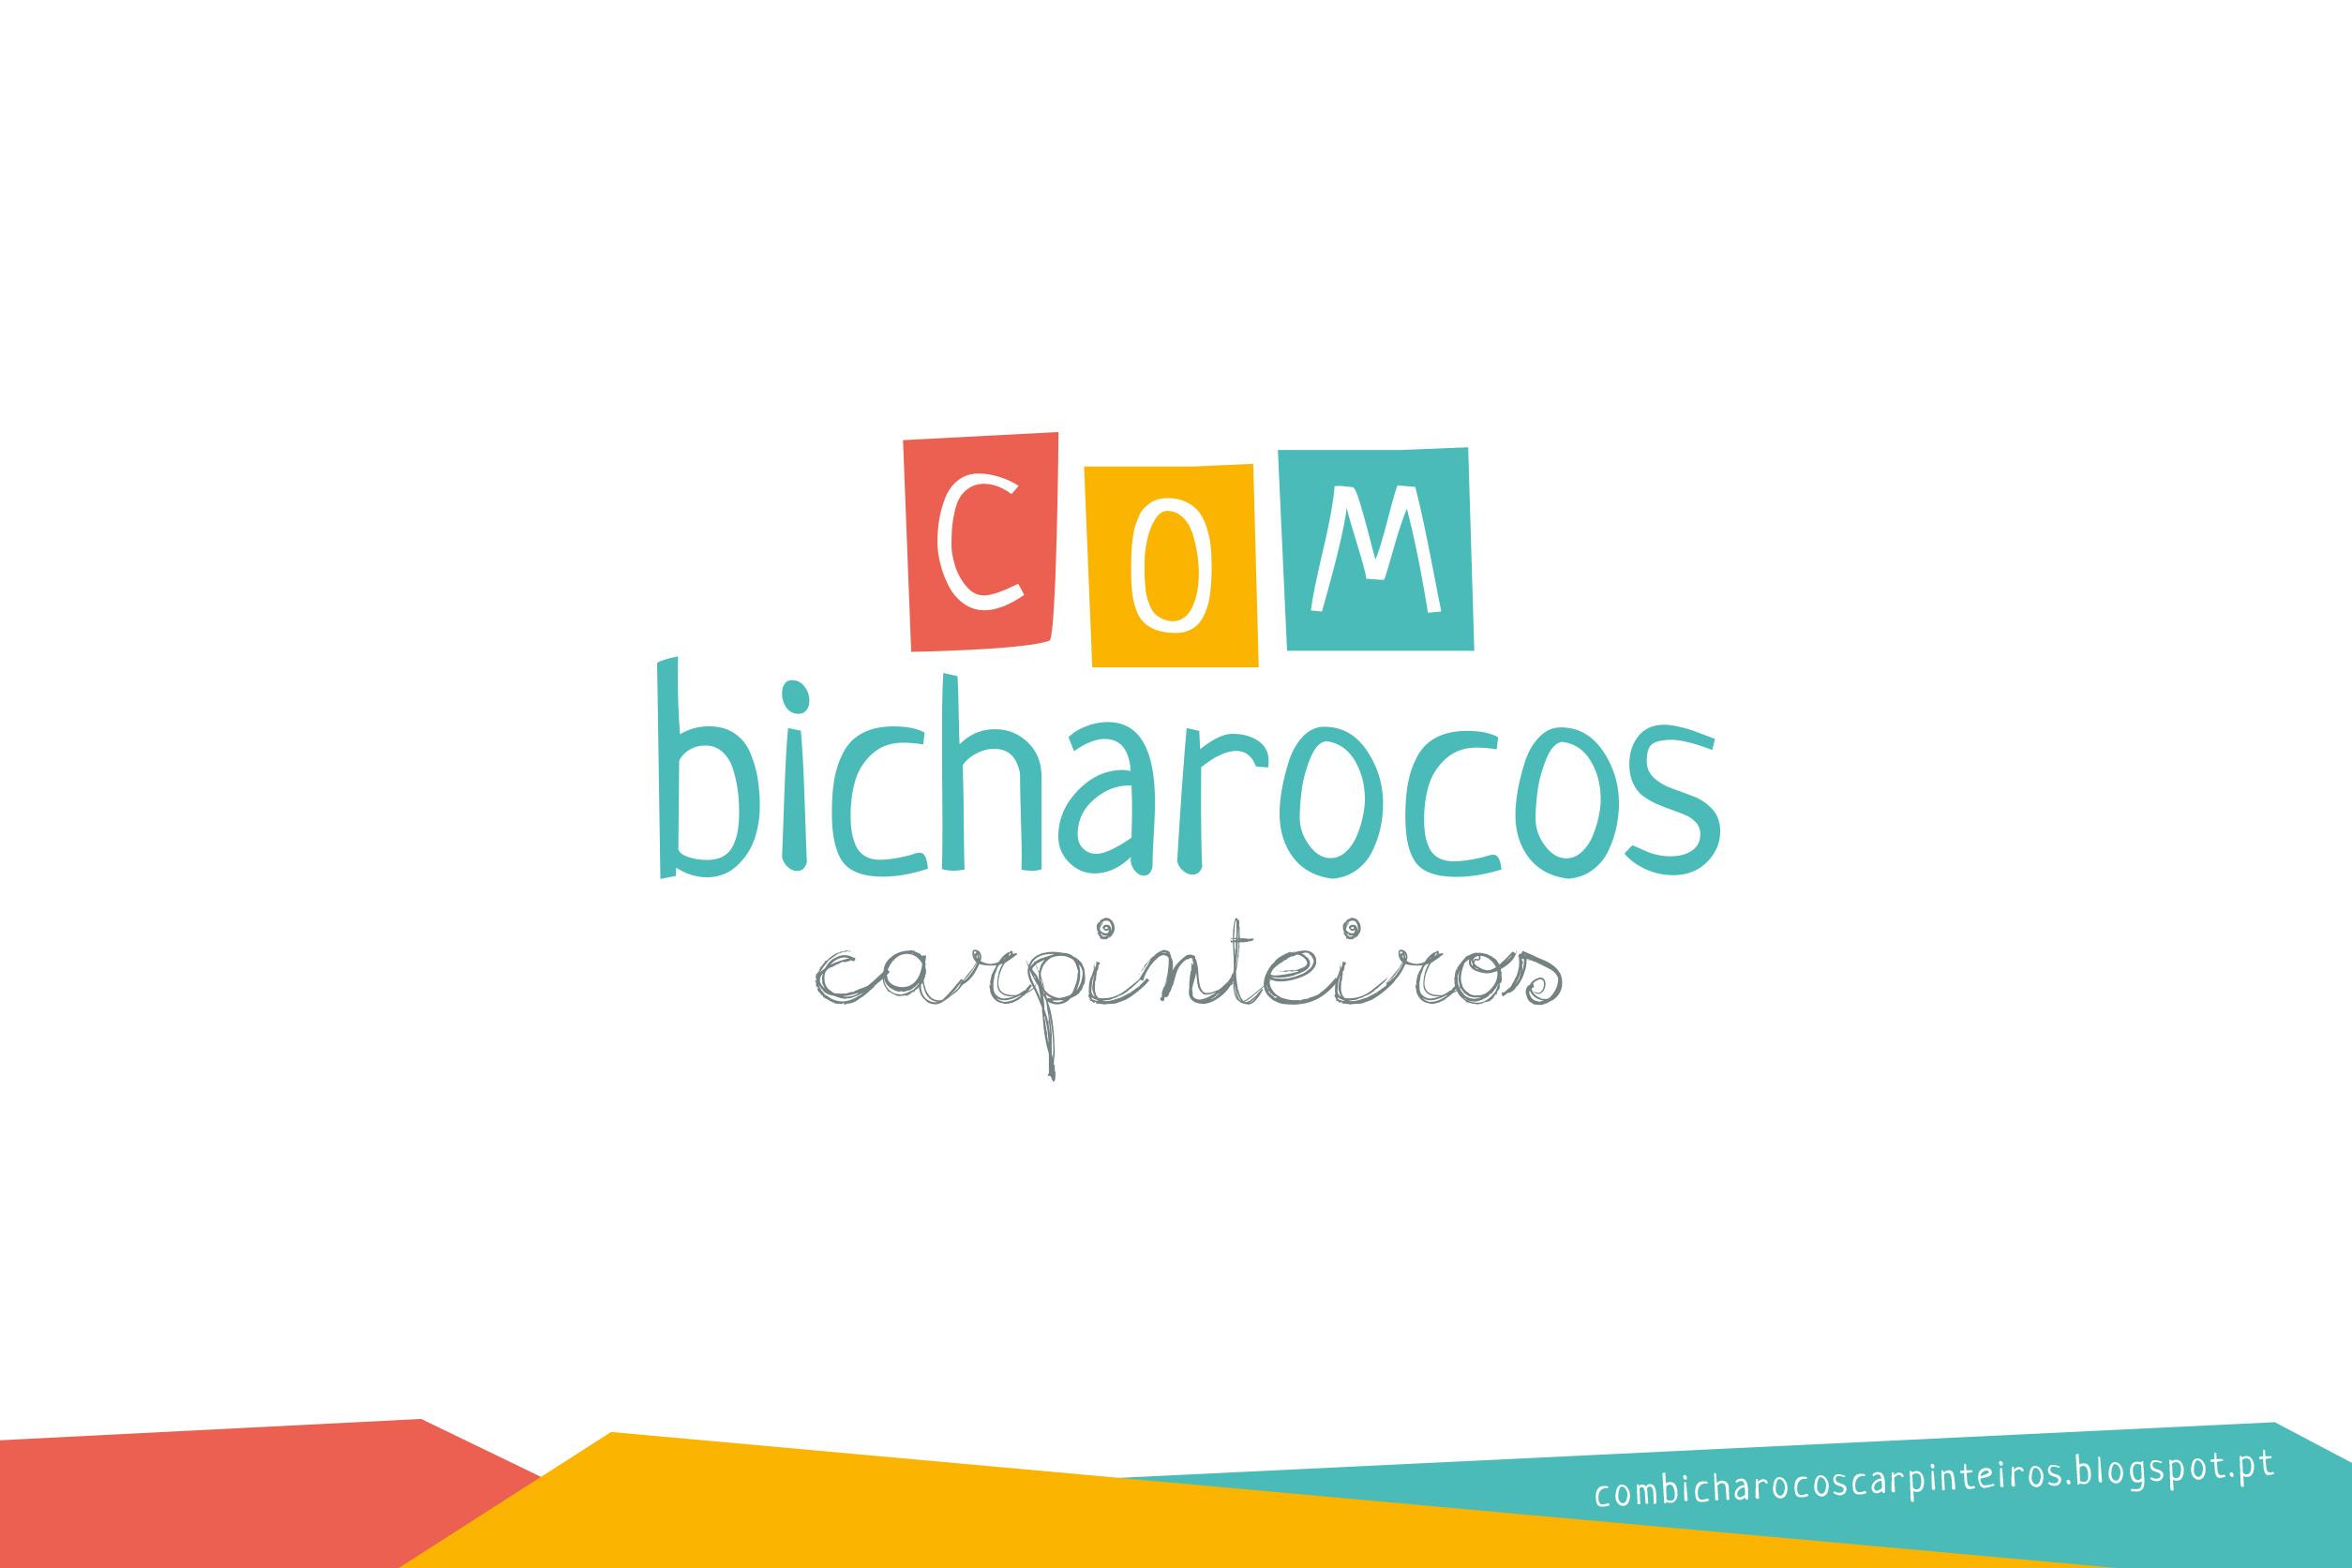 bicharocos_logo2